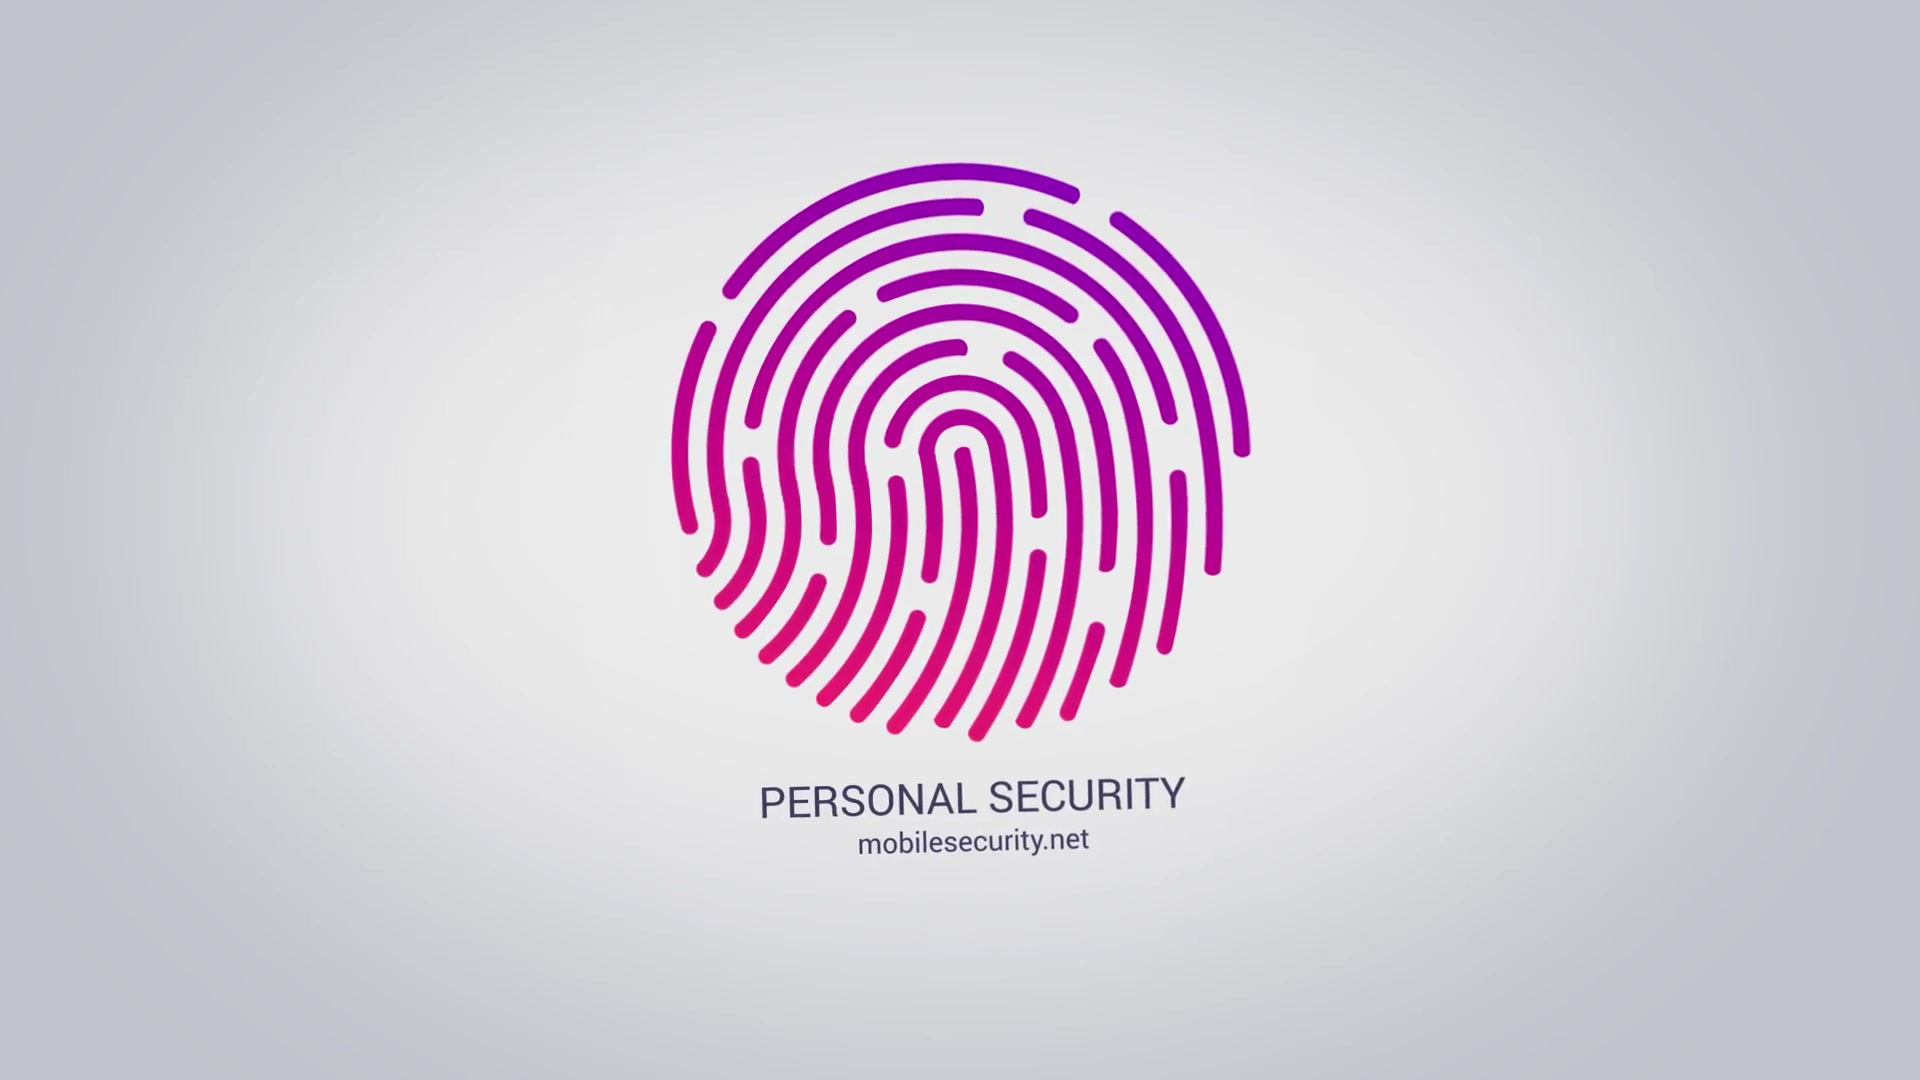 Fingerprint logo - Download Videohive 18183215